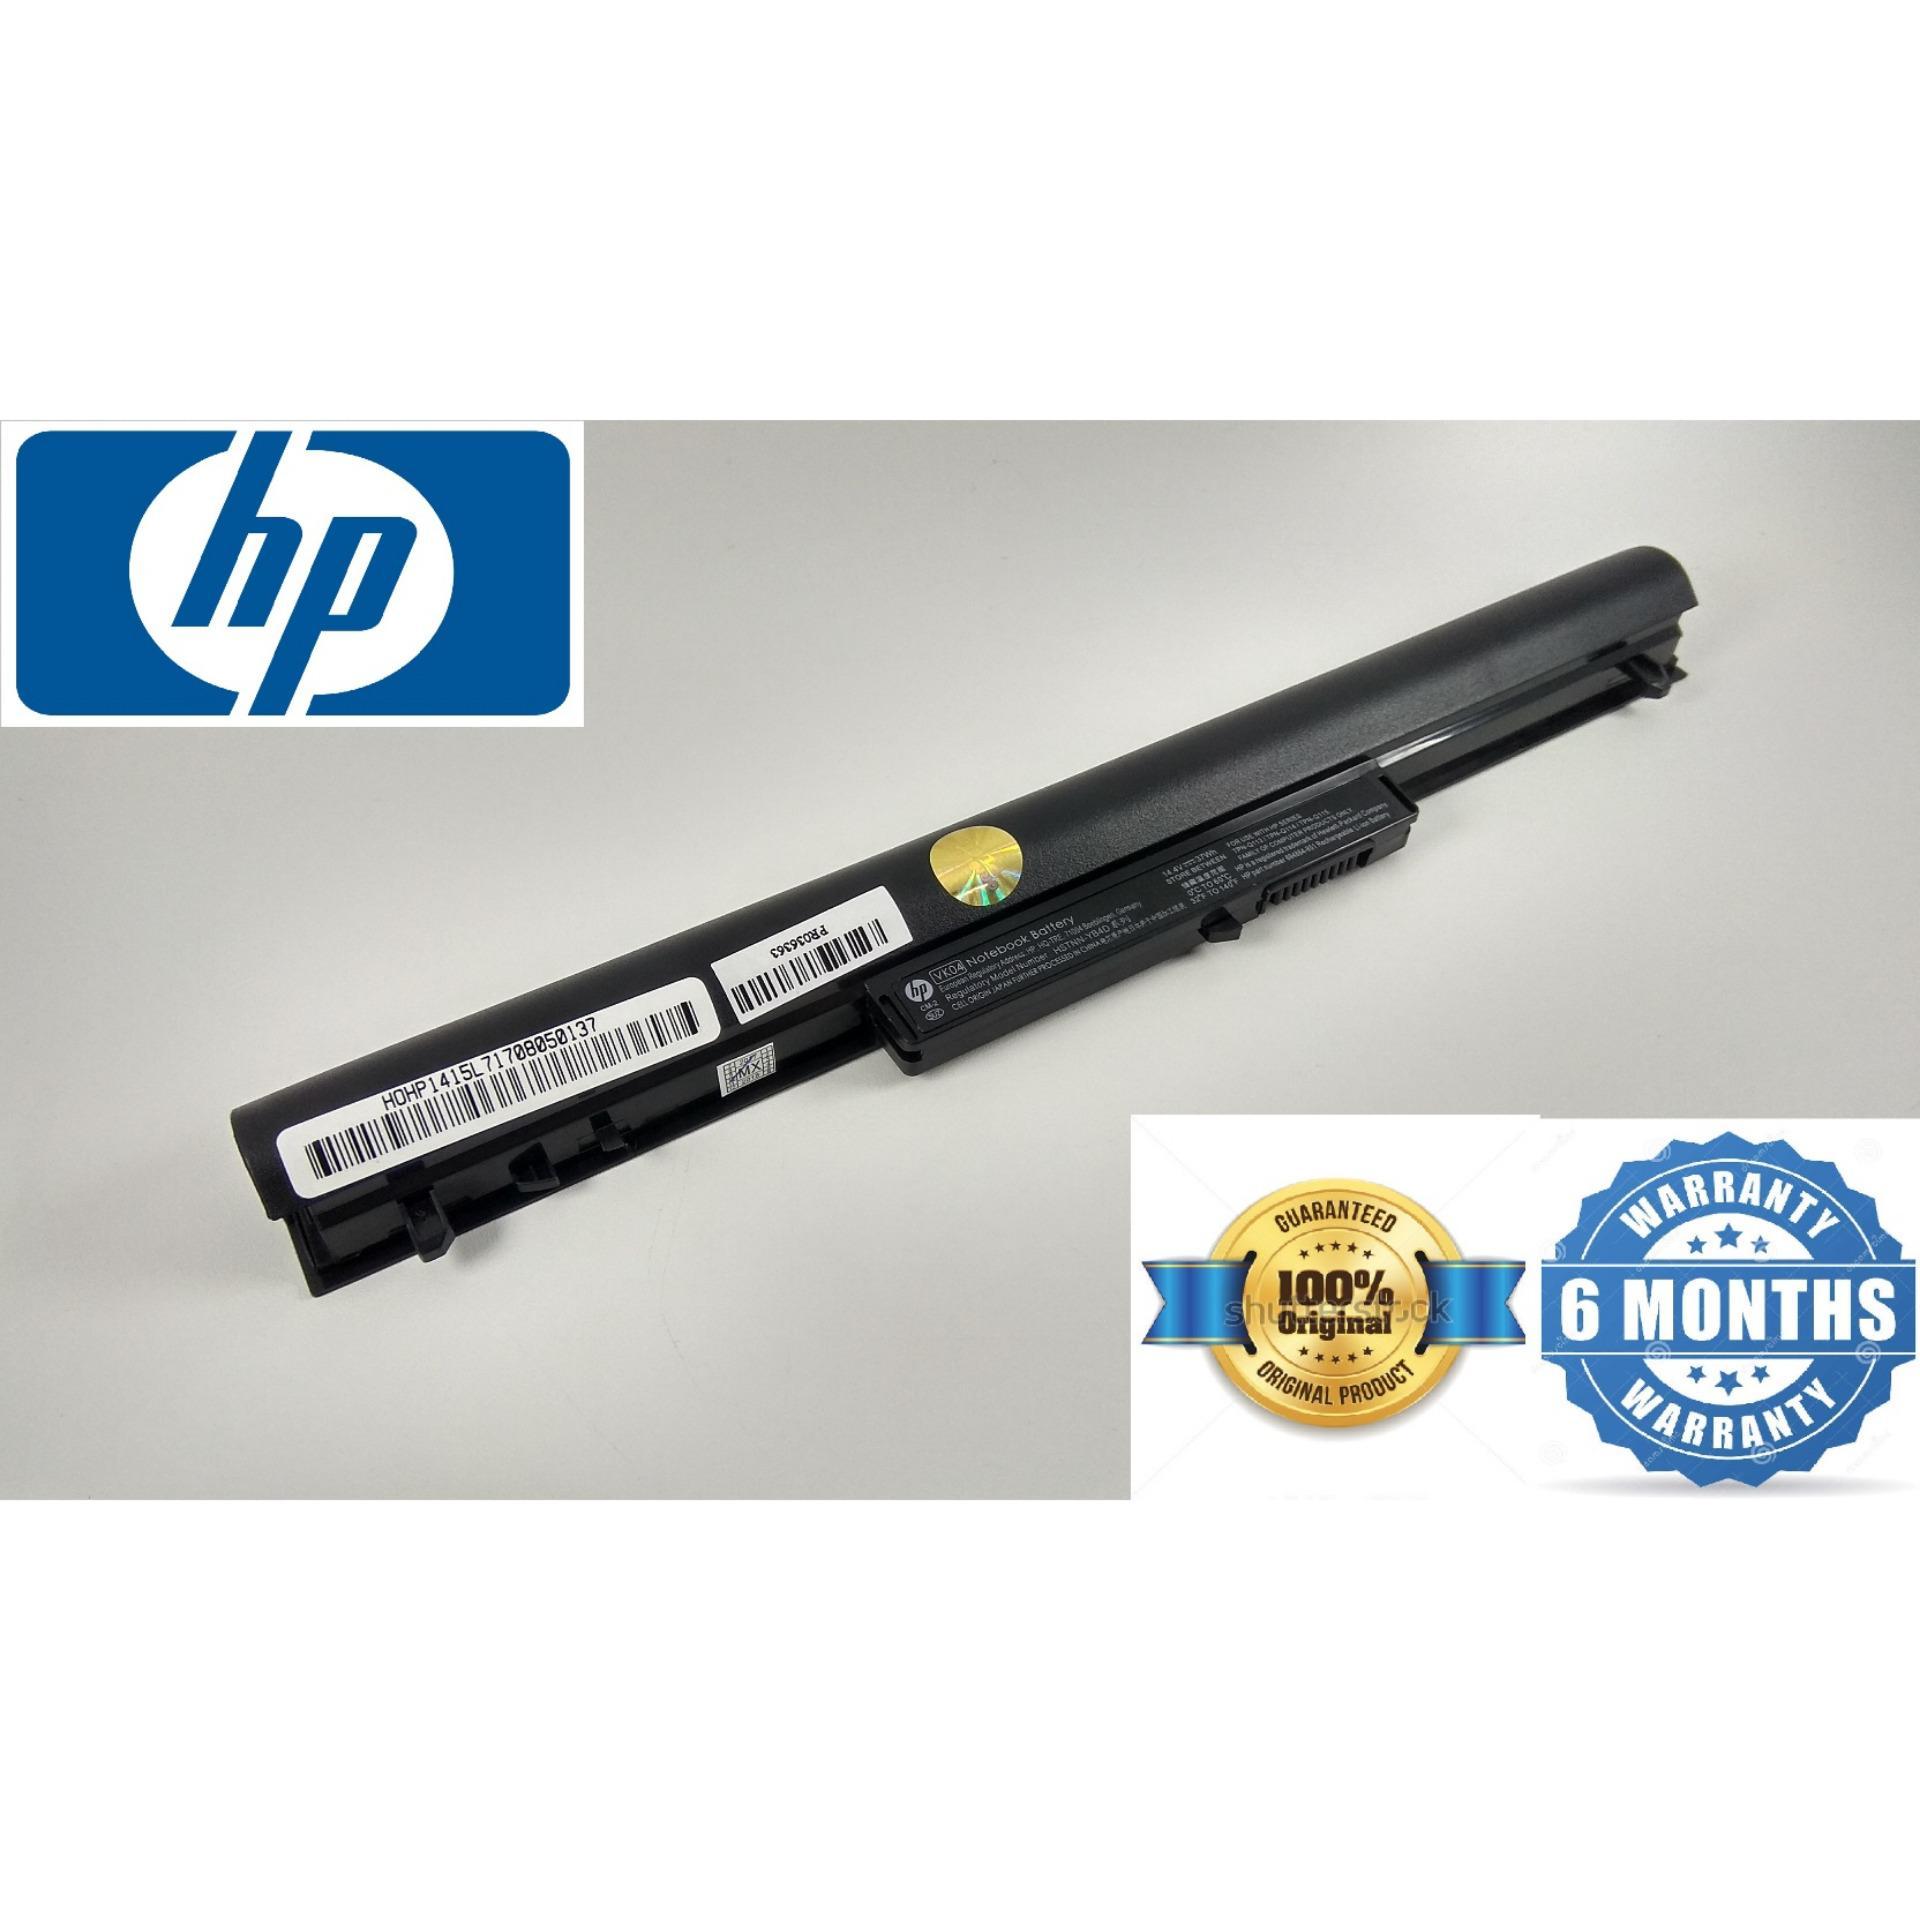 Hp Original Baterai Laptop Pavilion VK04 ,14 14t 14z, 15 15t 15z Series/ HP Pavilion Sleekbook 14 14t 14z, 15 15t 15z Series/ 694864-851, HSTNN-DB4D, HSTNN-YB4D, HSTNN-YB4M